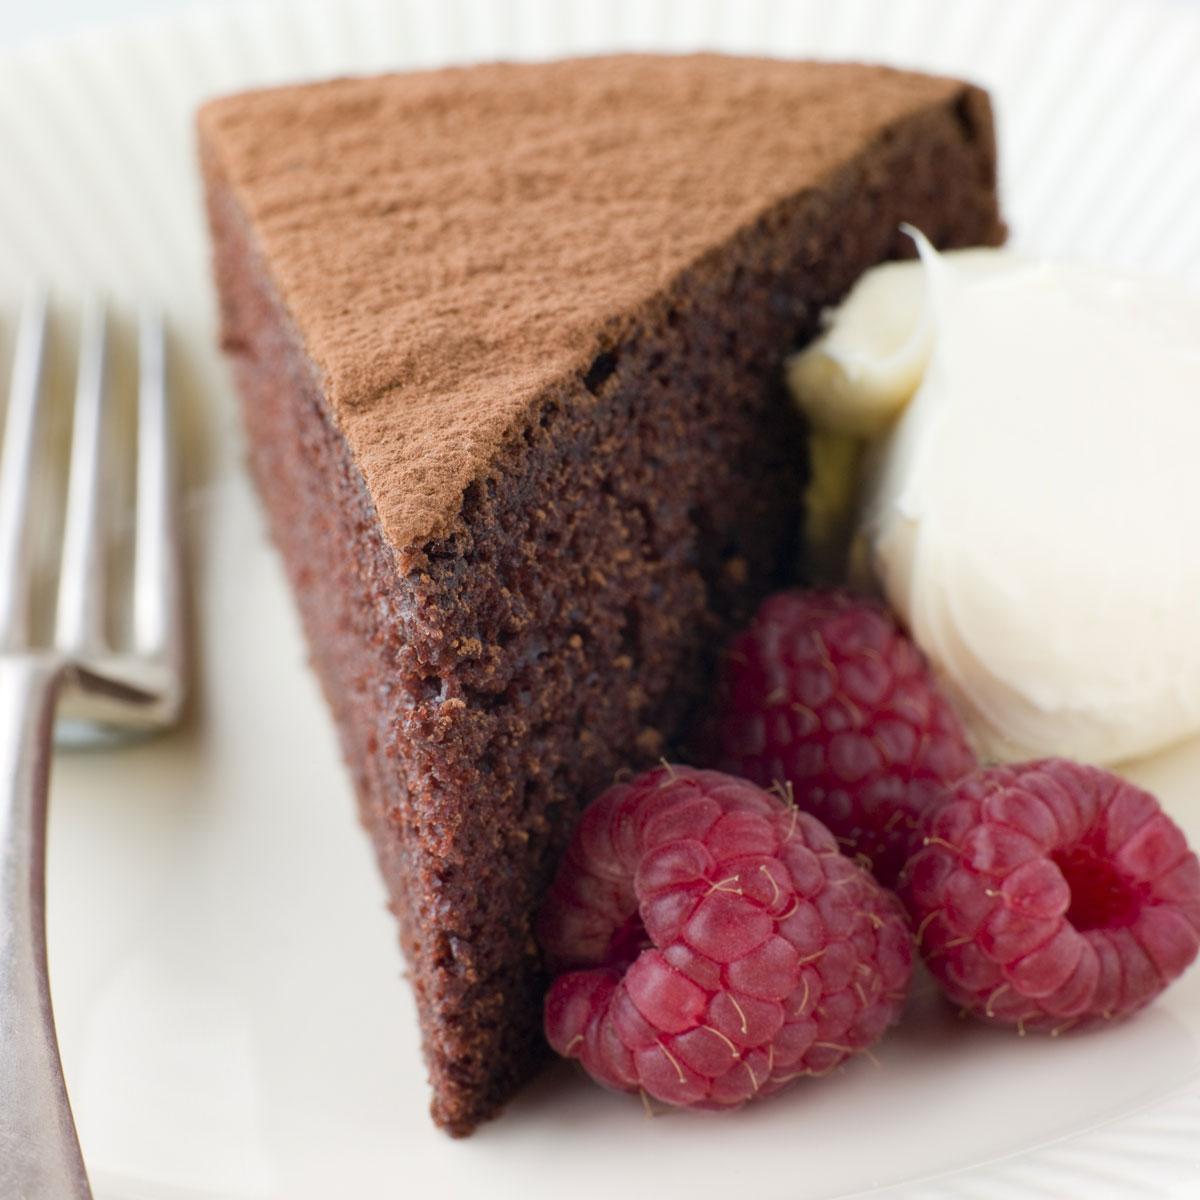 recette biscuit au chocolat sans gluten ni lait cuisine madame figaro. Black Bedroom Furniture Sets. Home Design Ideas